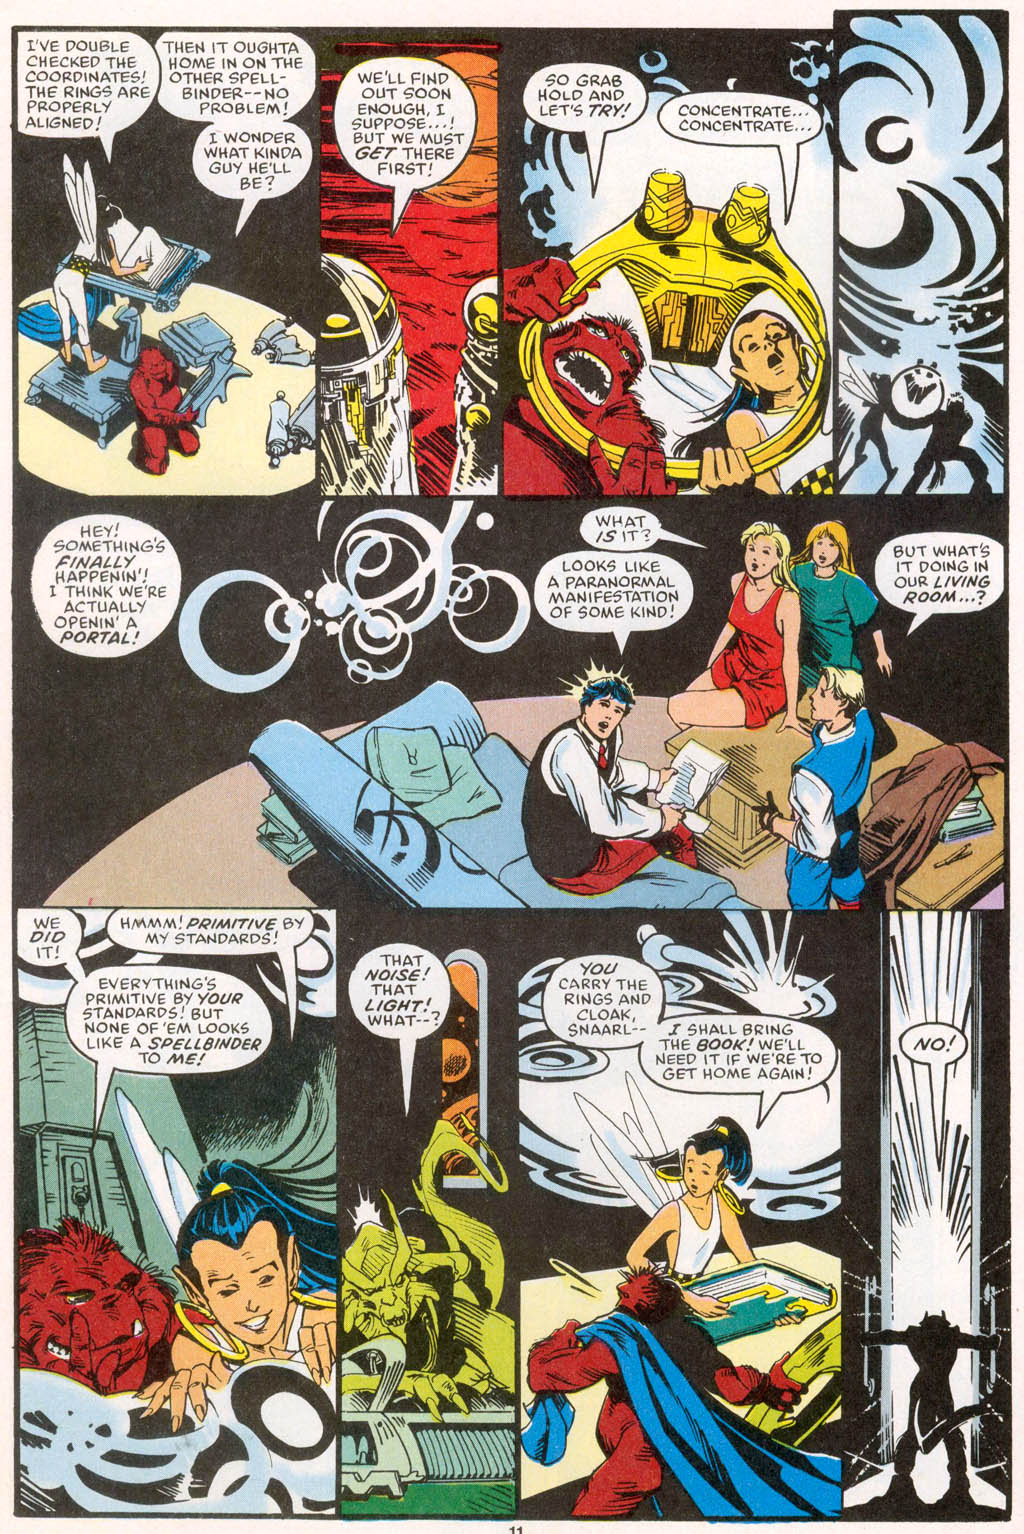 Read online Spellbound comic -  Issue #1 - 12